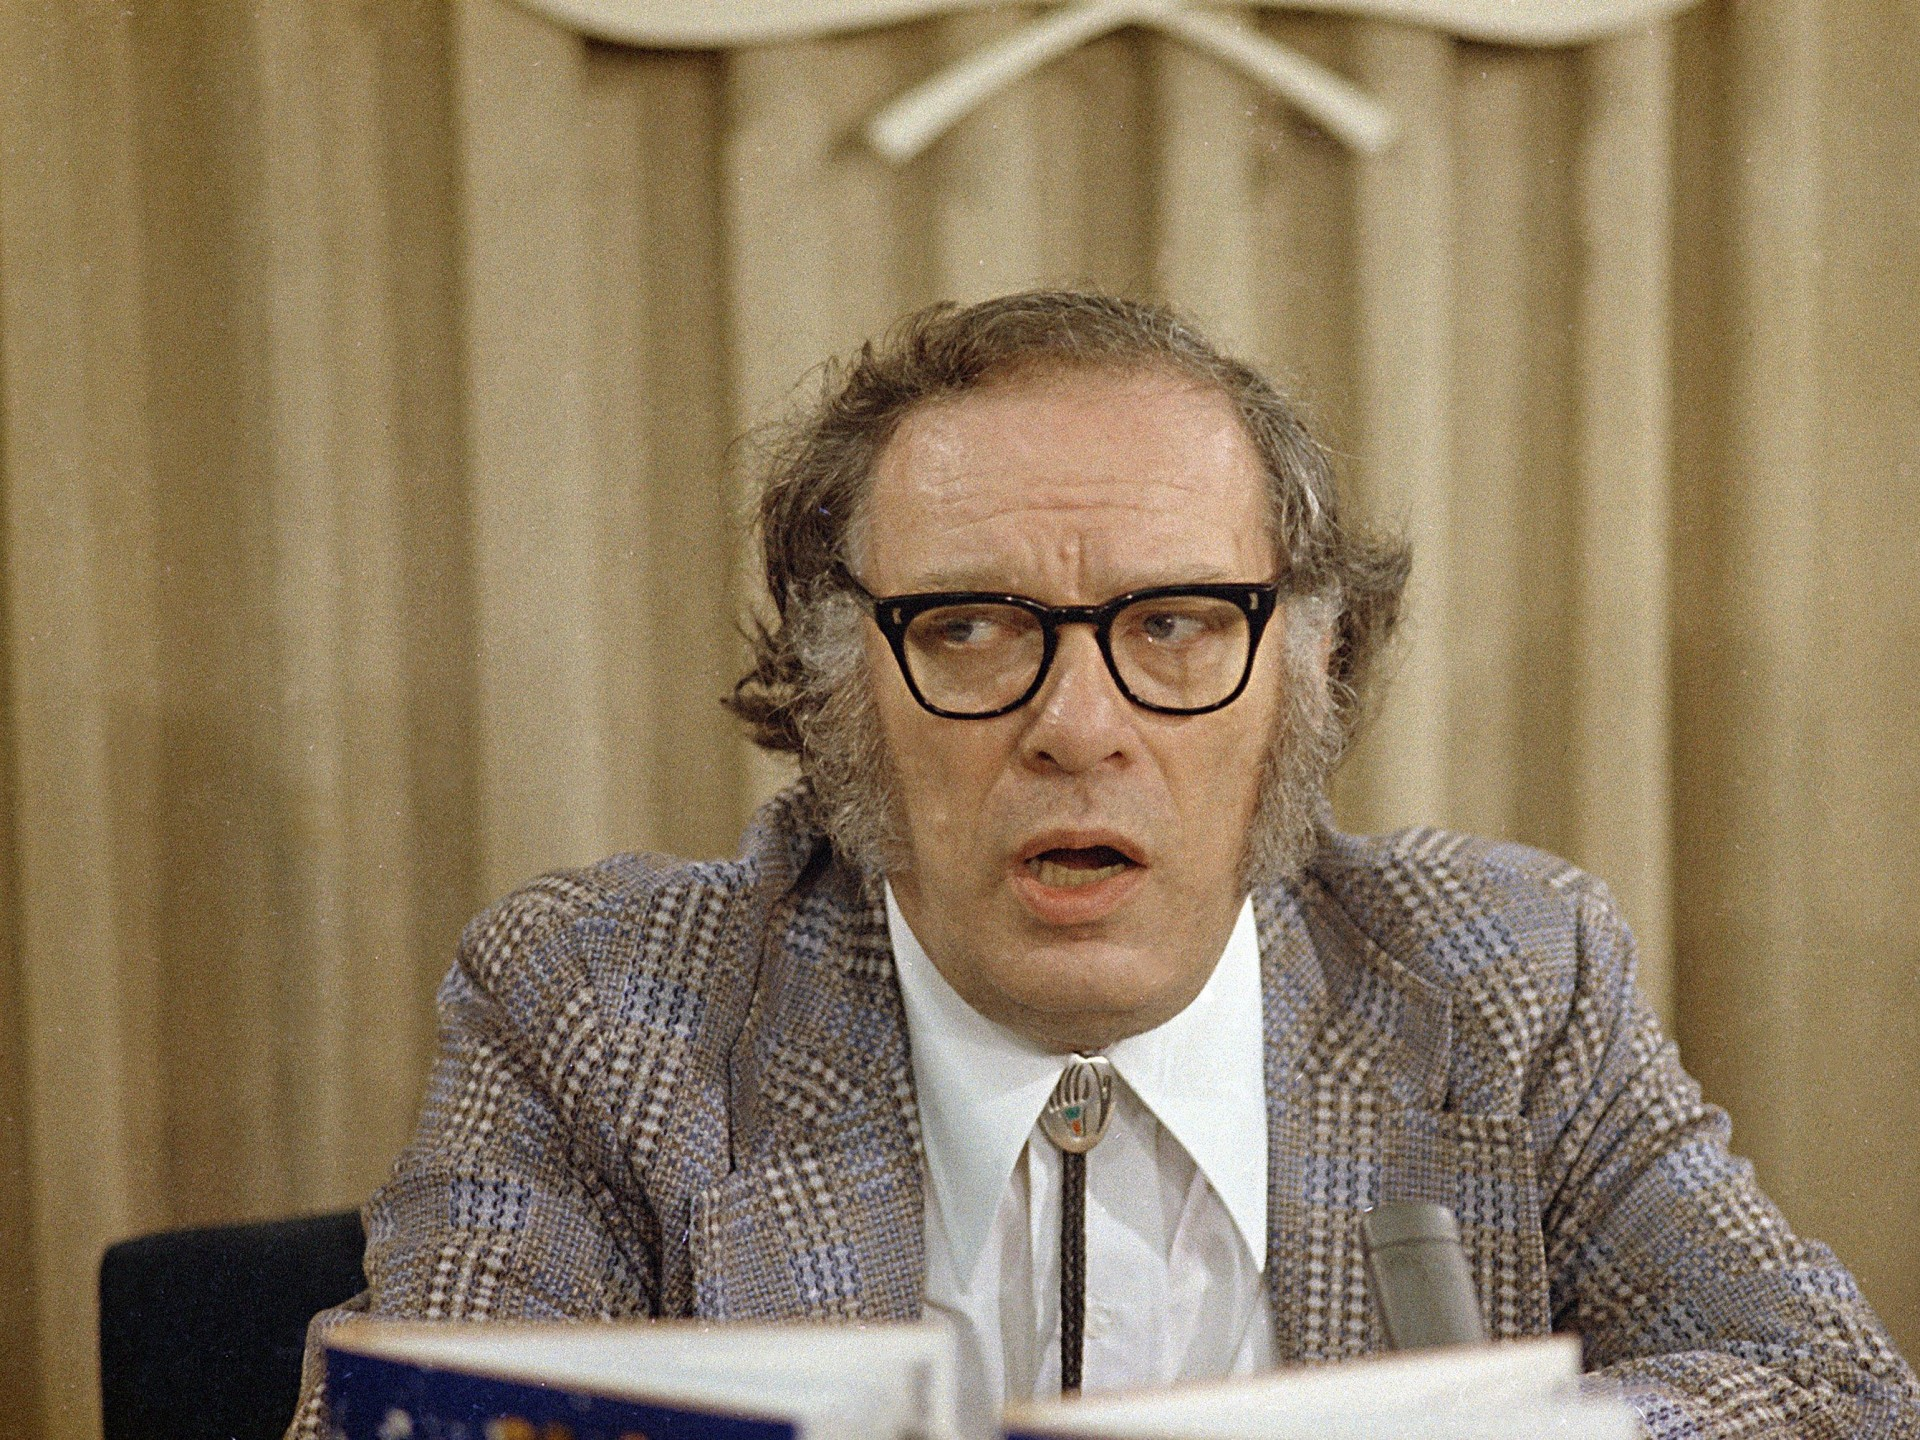 005 Image Essay Example Isaac Asimov Awful Essays On Creativity Intelligence 1920